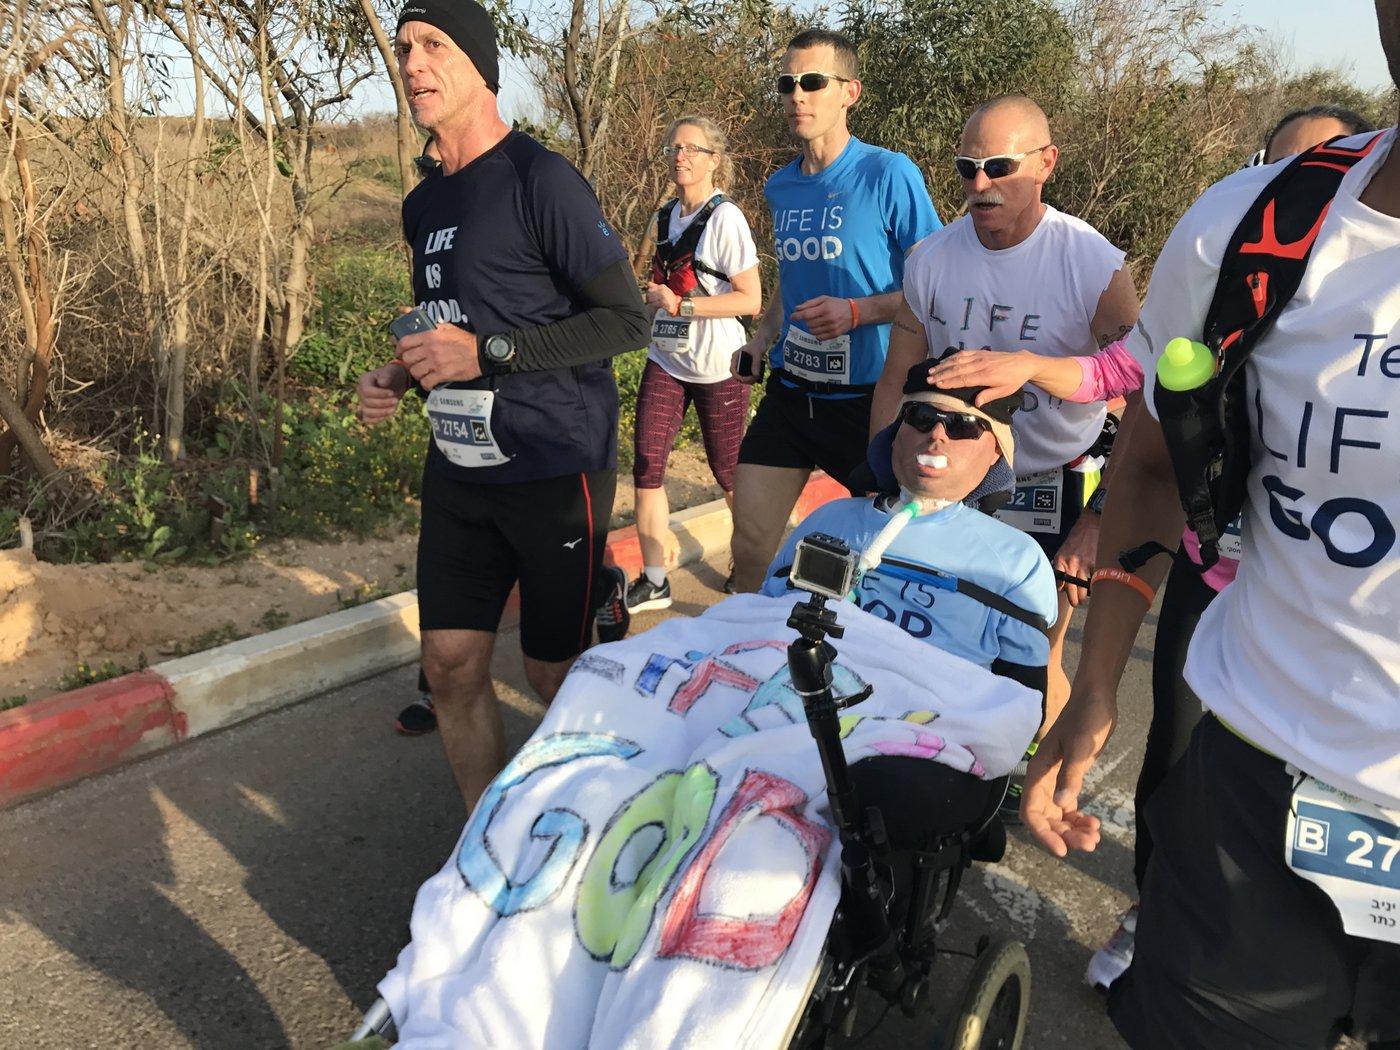 Tel Aviv Marathon on wheelchair